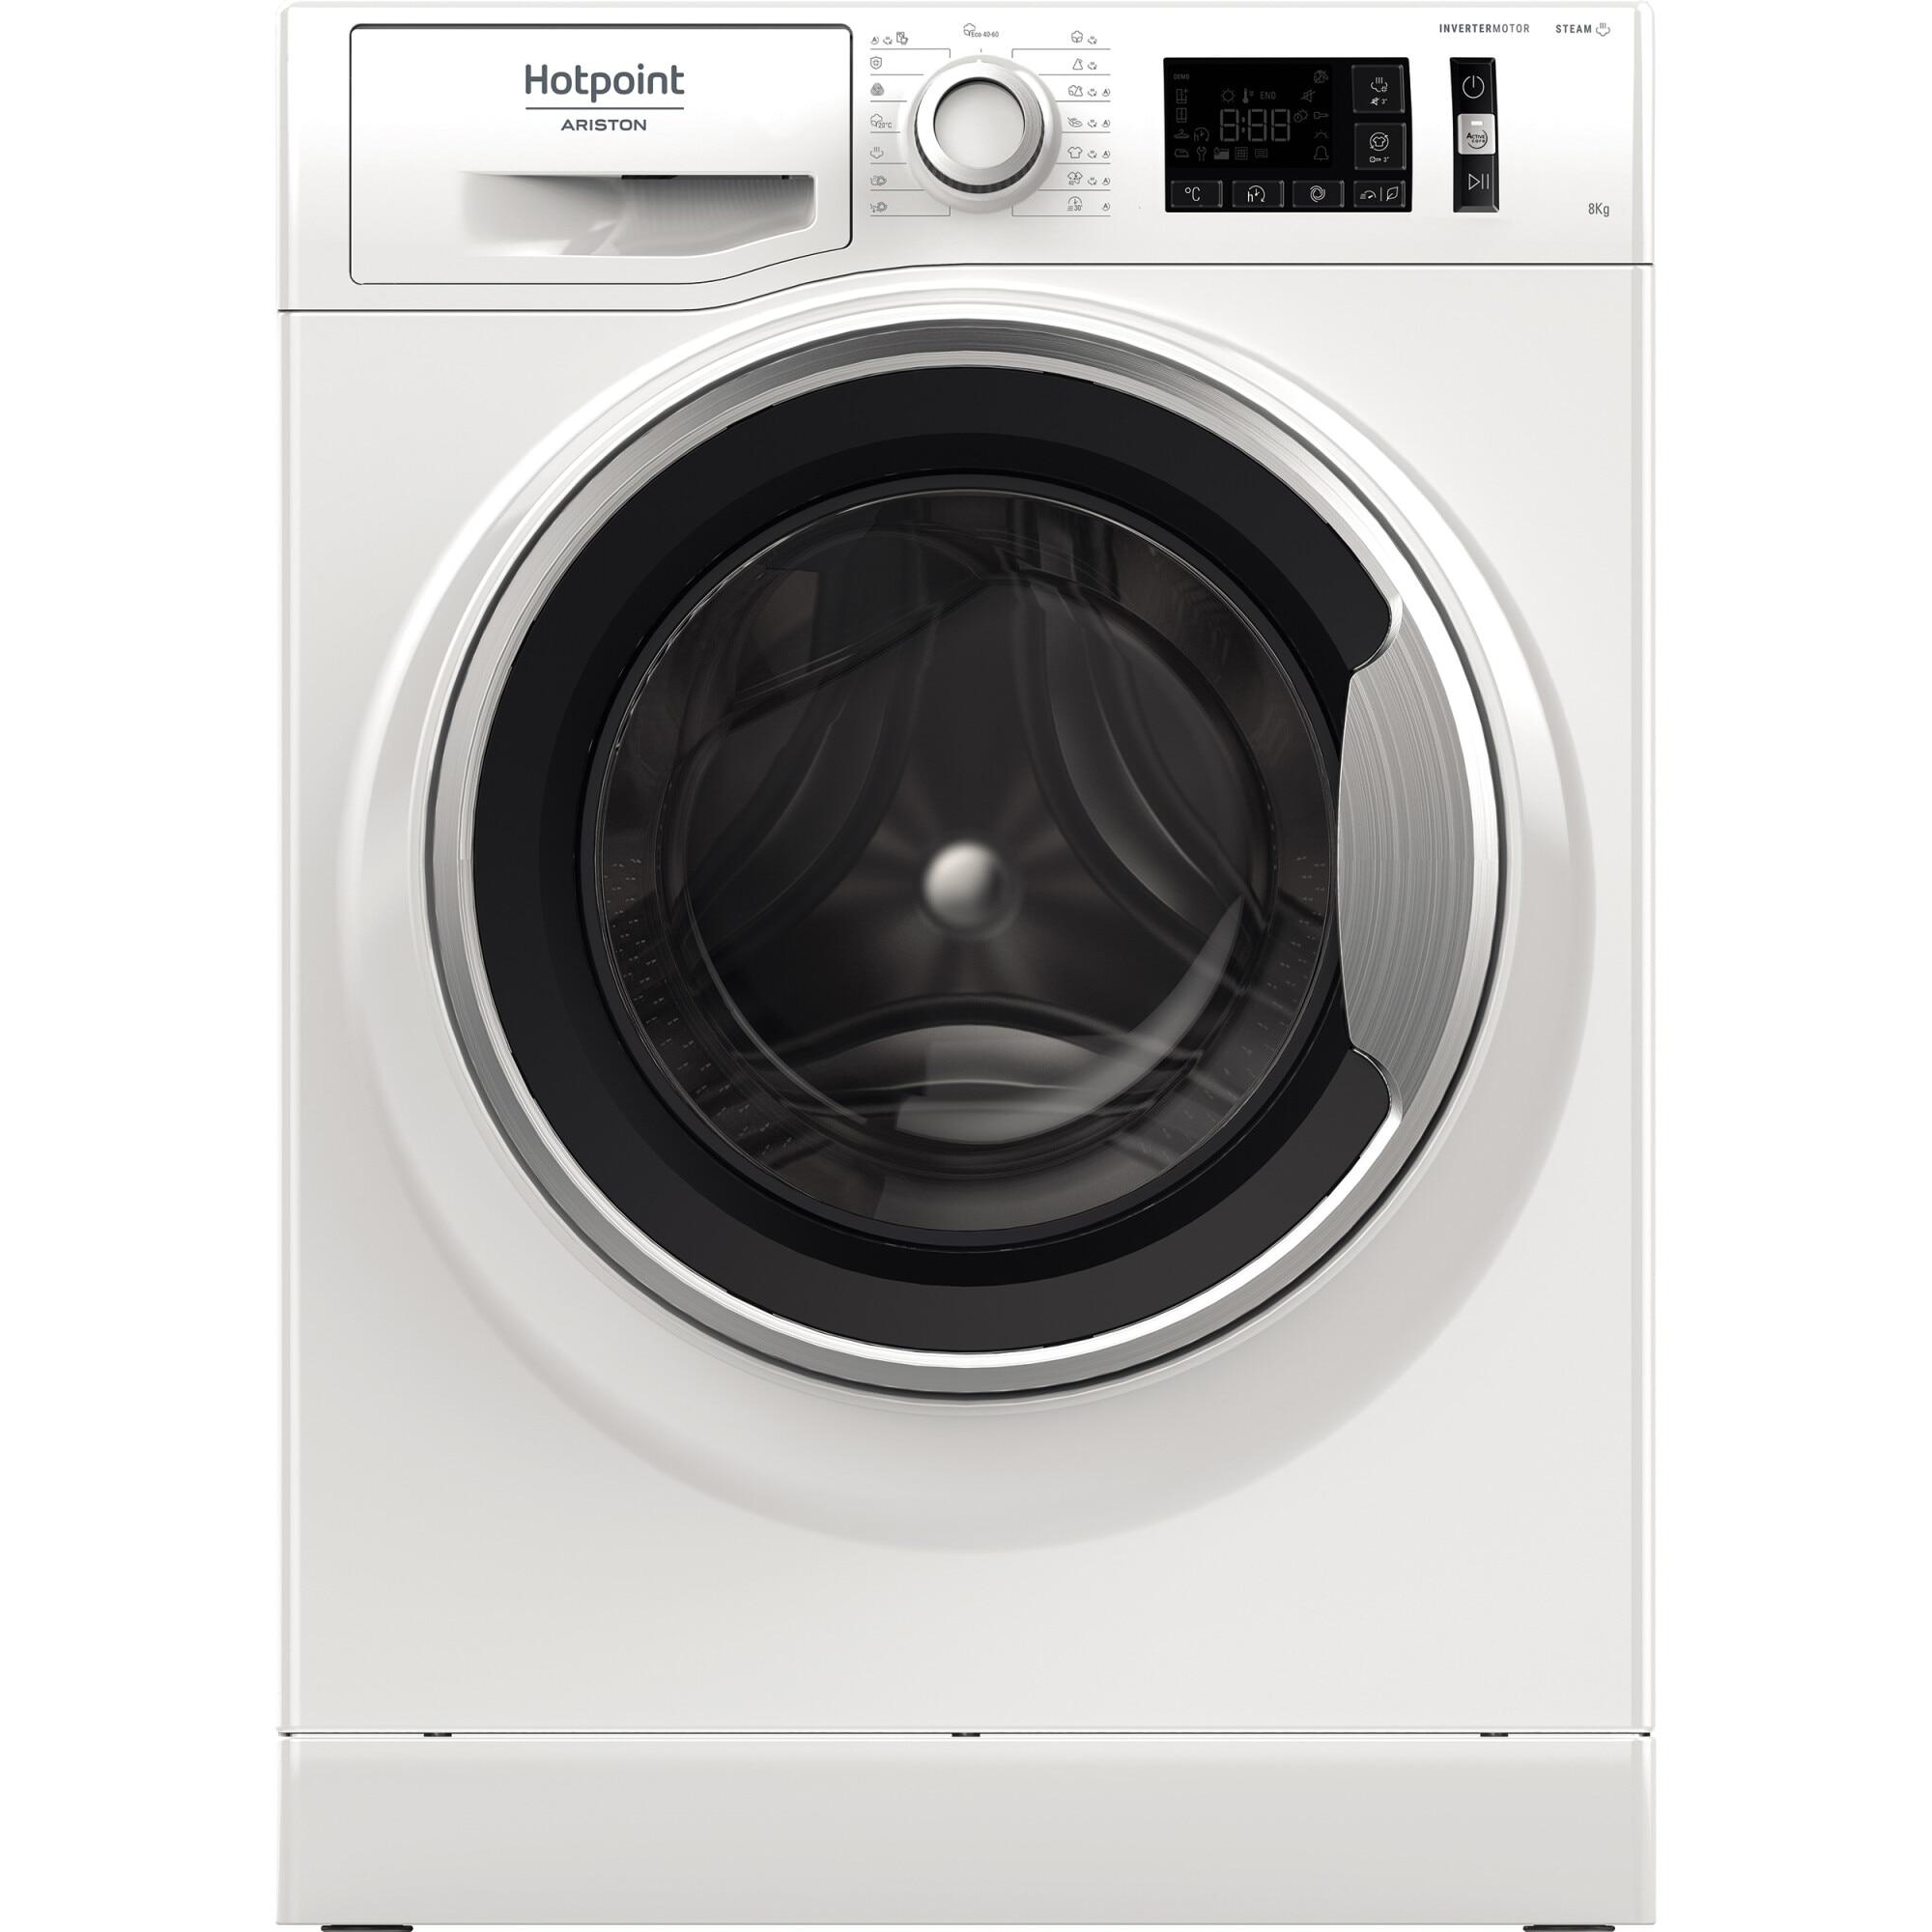 Fotografie Masina de spalat rufe Hotpoint NM11845WSAEUN, 8 kg, 1400 RPM, Clasa B, Motor Inverter, Steam Refresh, Steam Hygiene, Alb